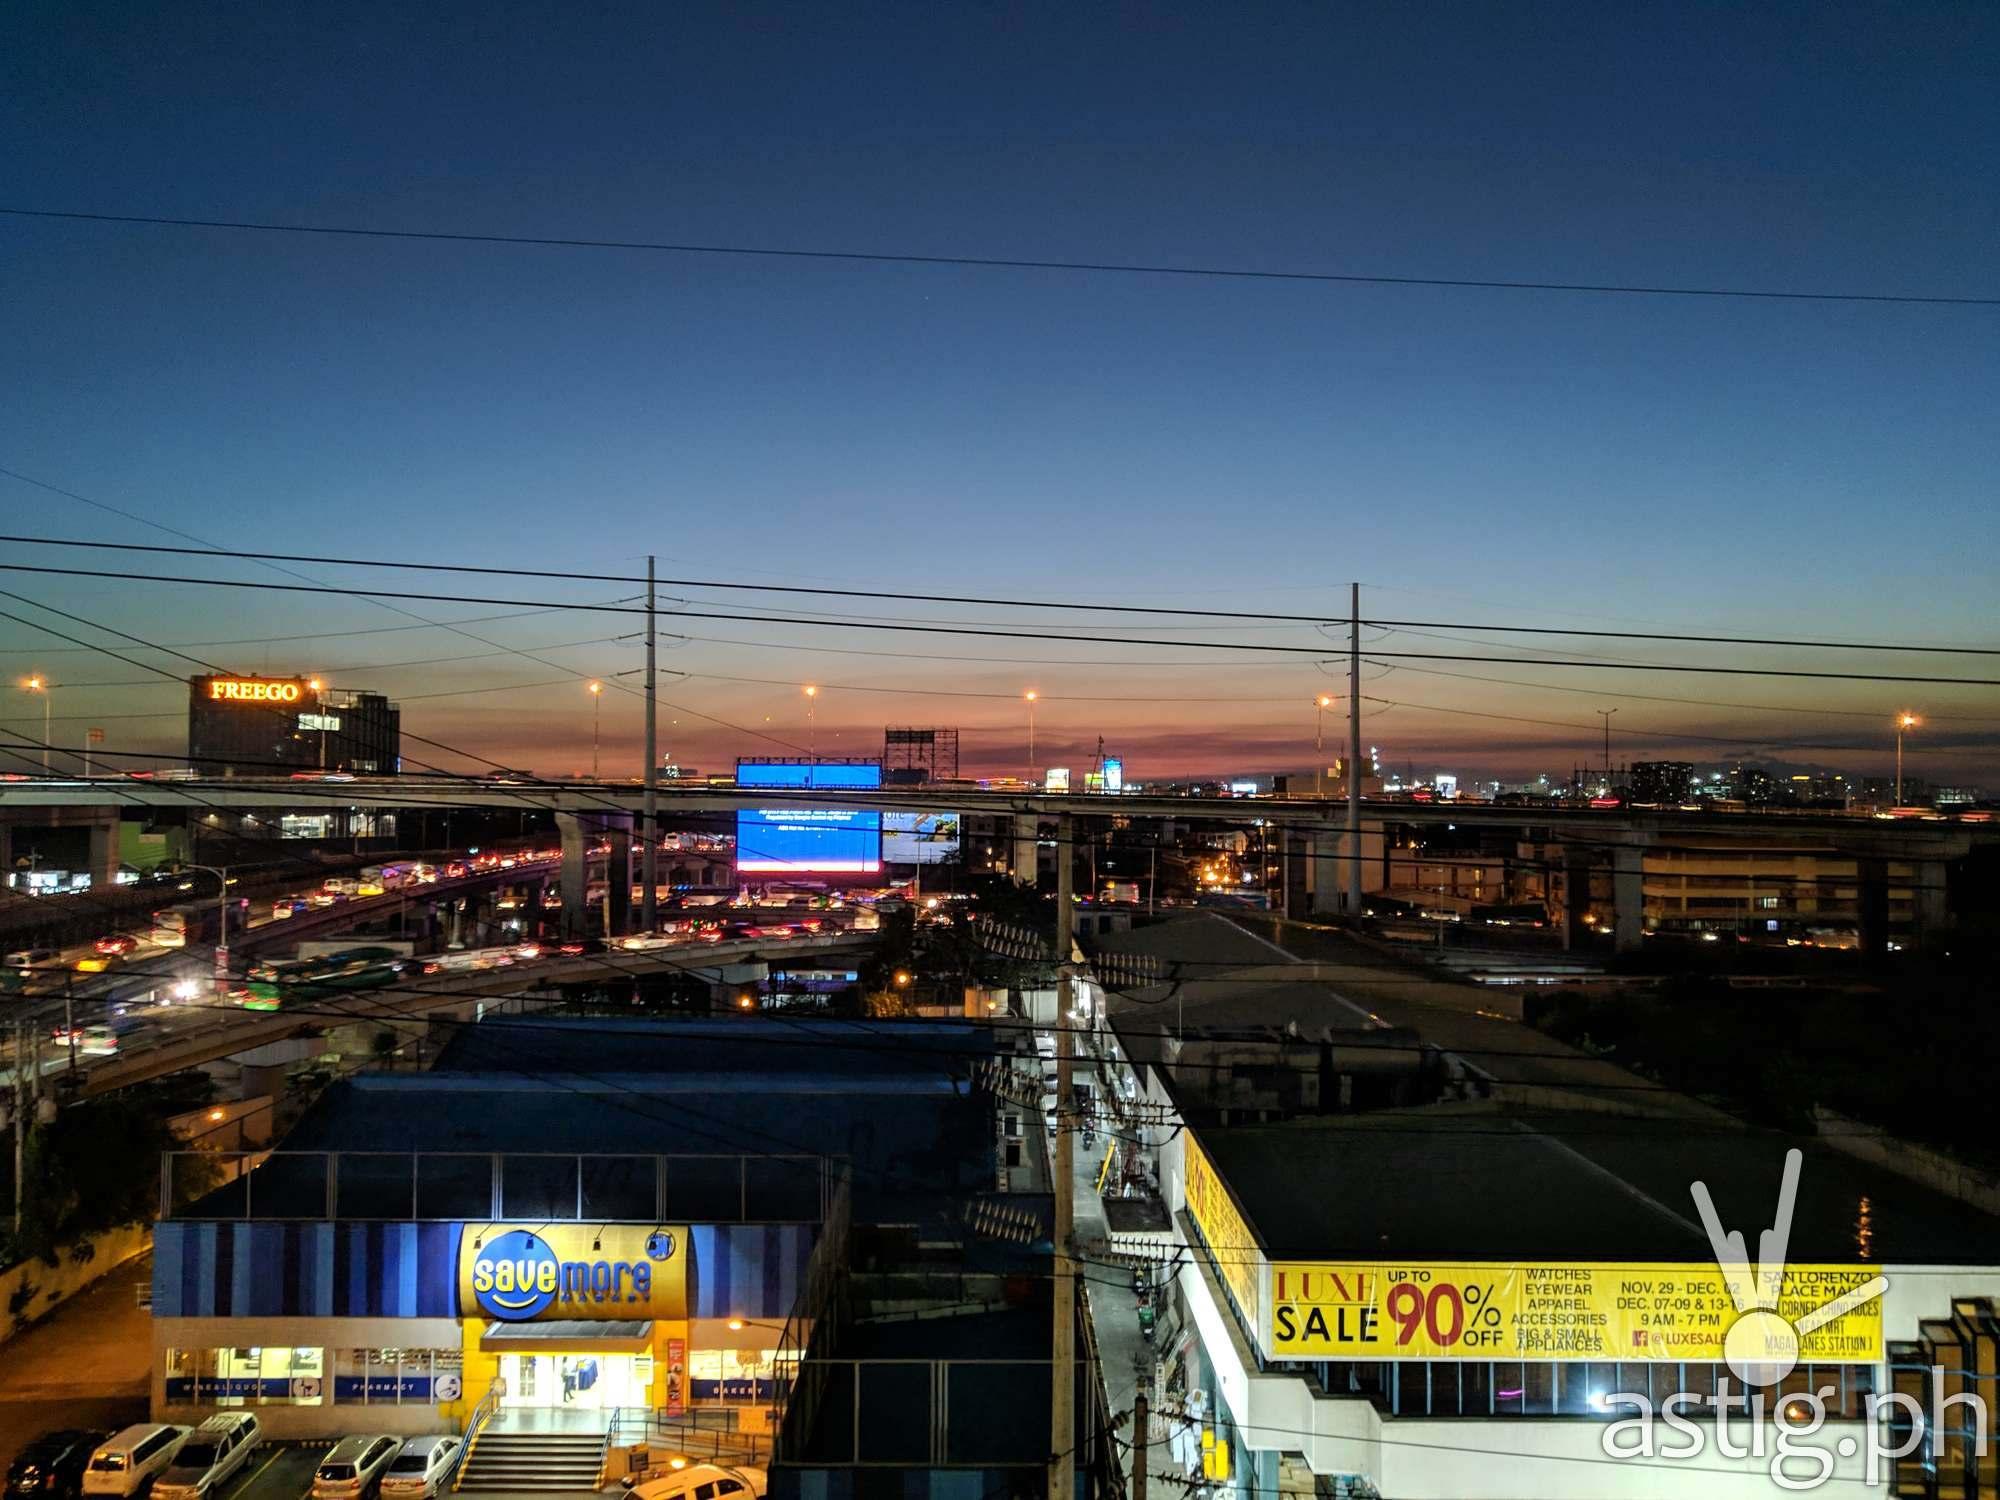 Zenfone Max Pro M2 photo sample - sunset